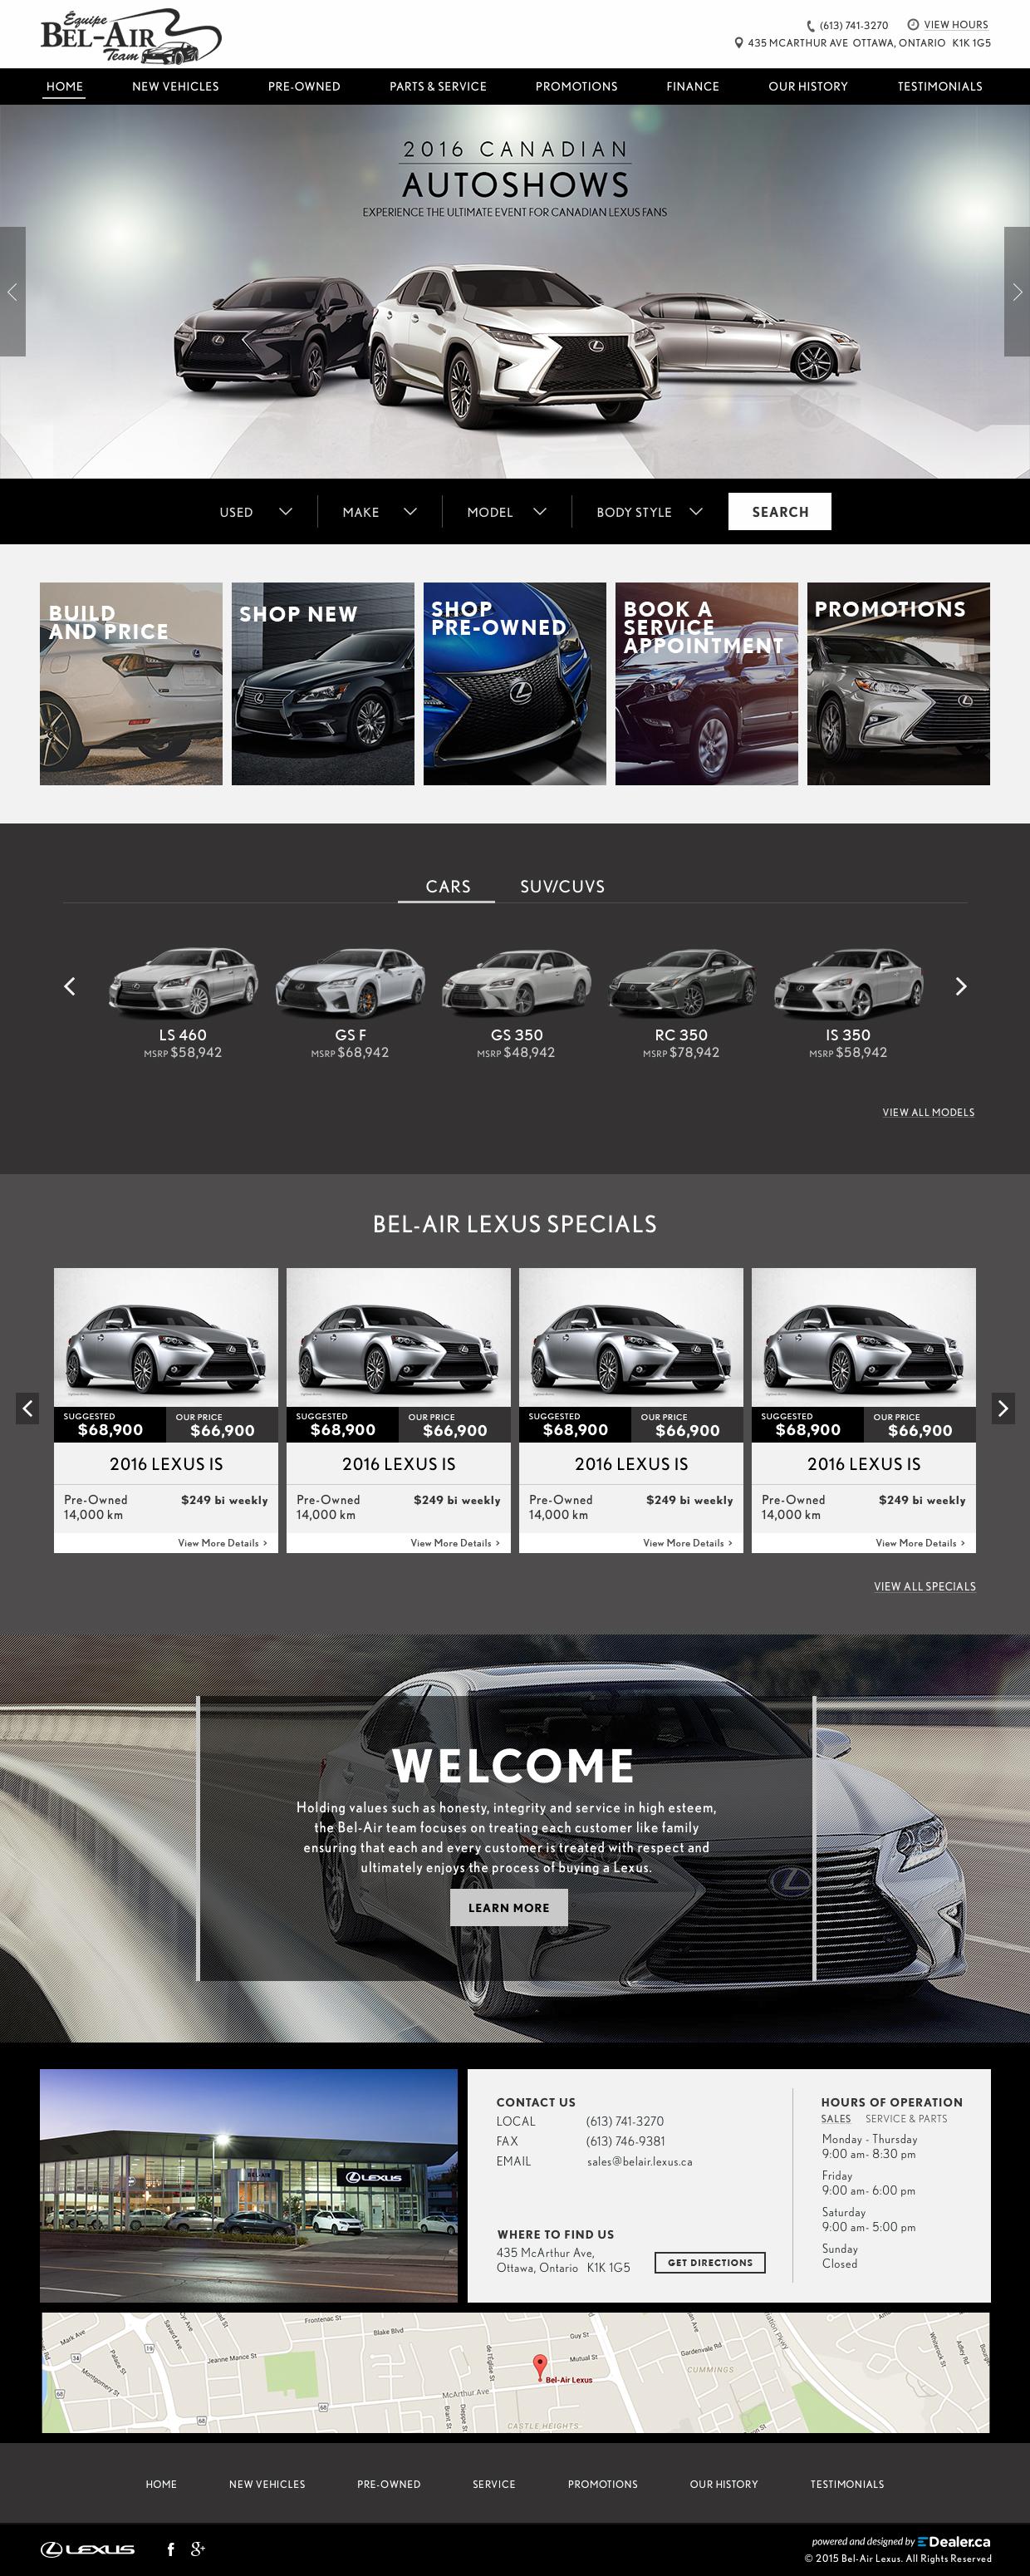 Bel-Air Lexus